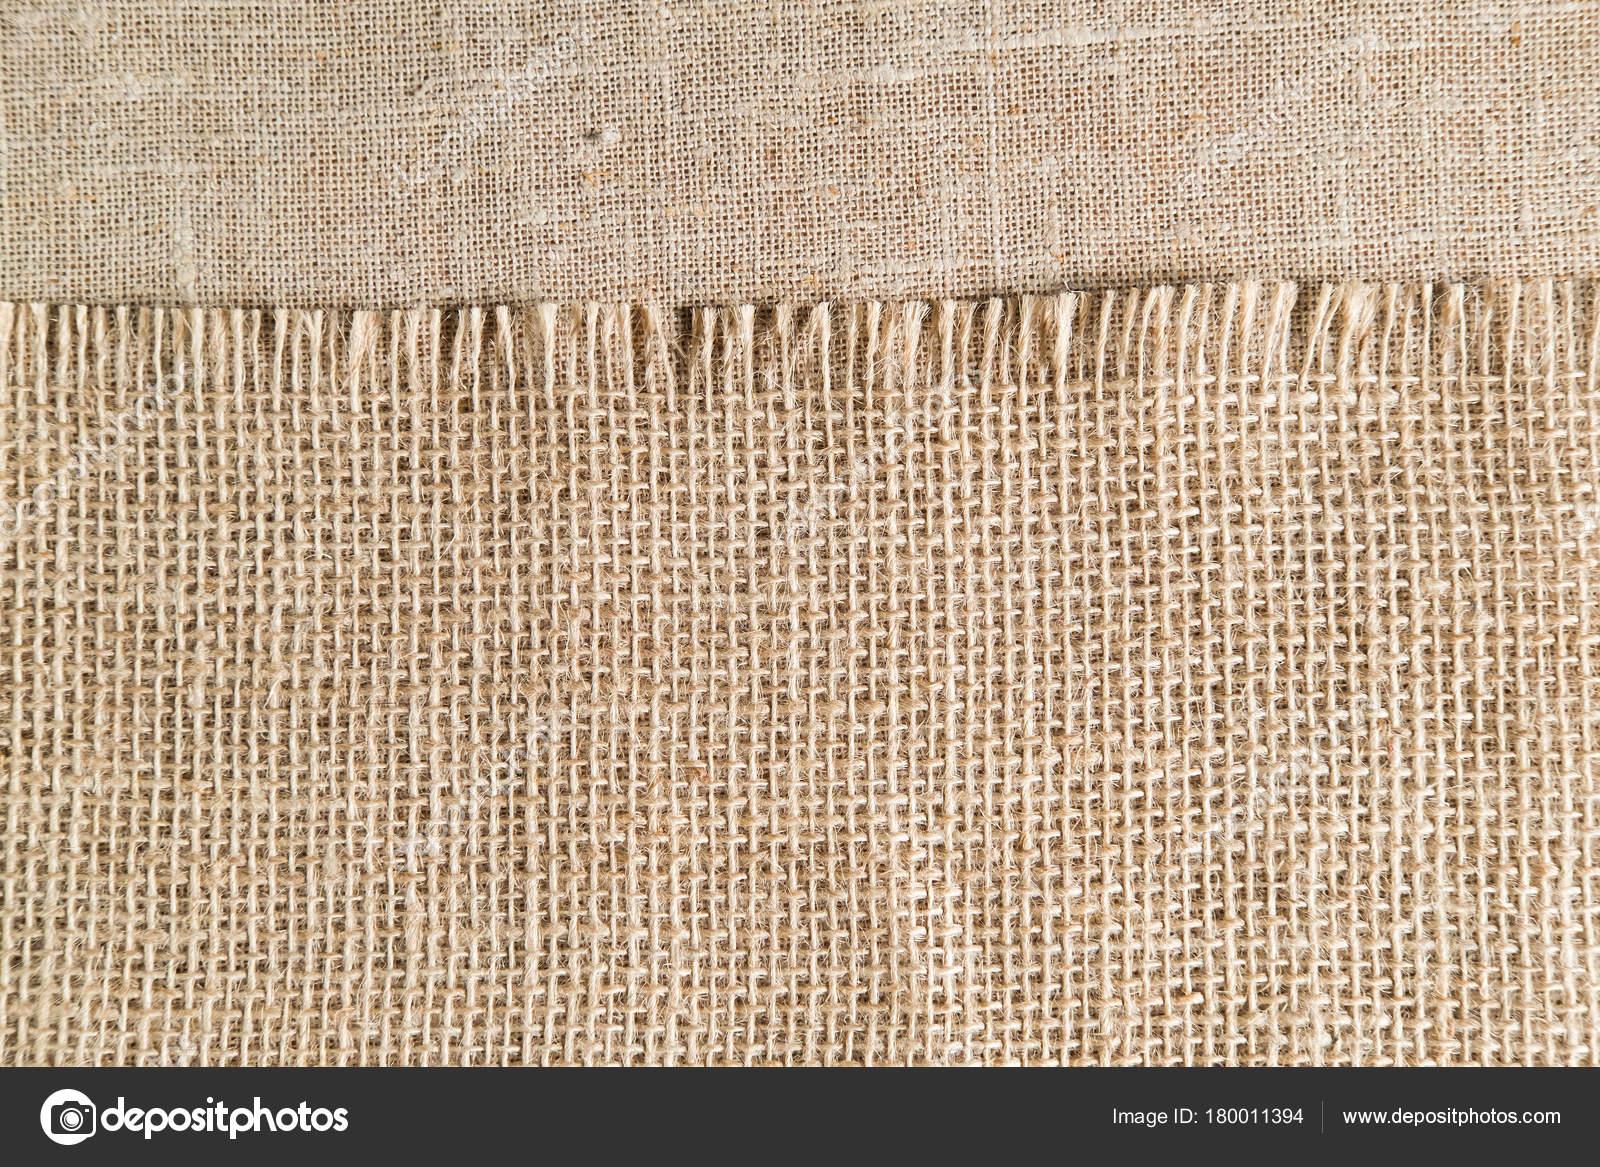 Linen Cloth Napkin Big Texture Background Other Table Cloths U2014 Stock Photo